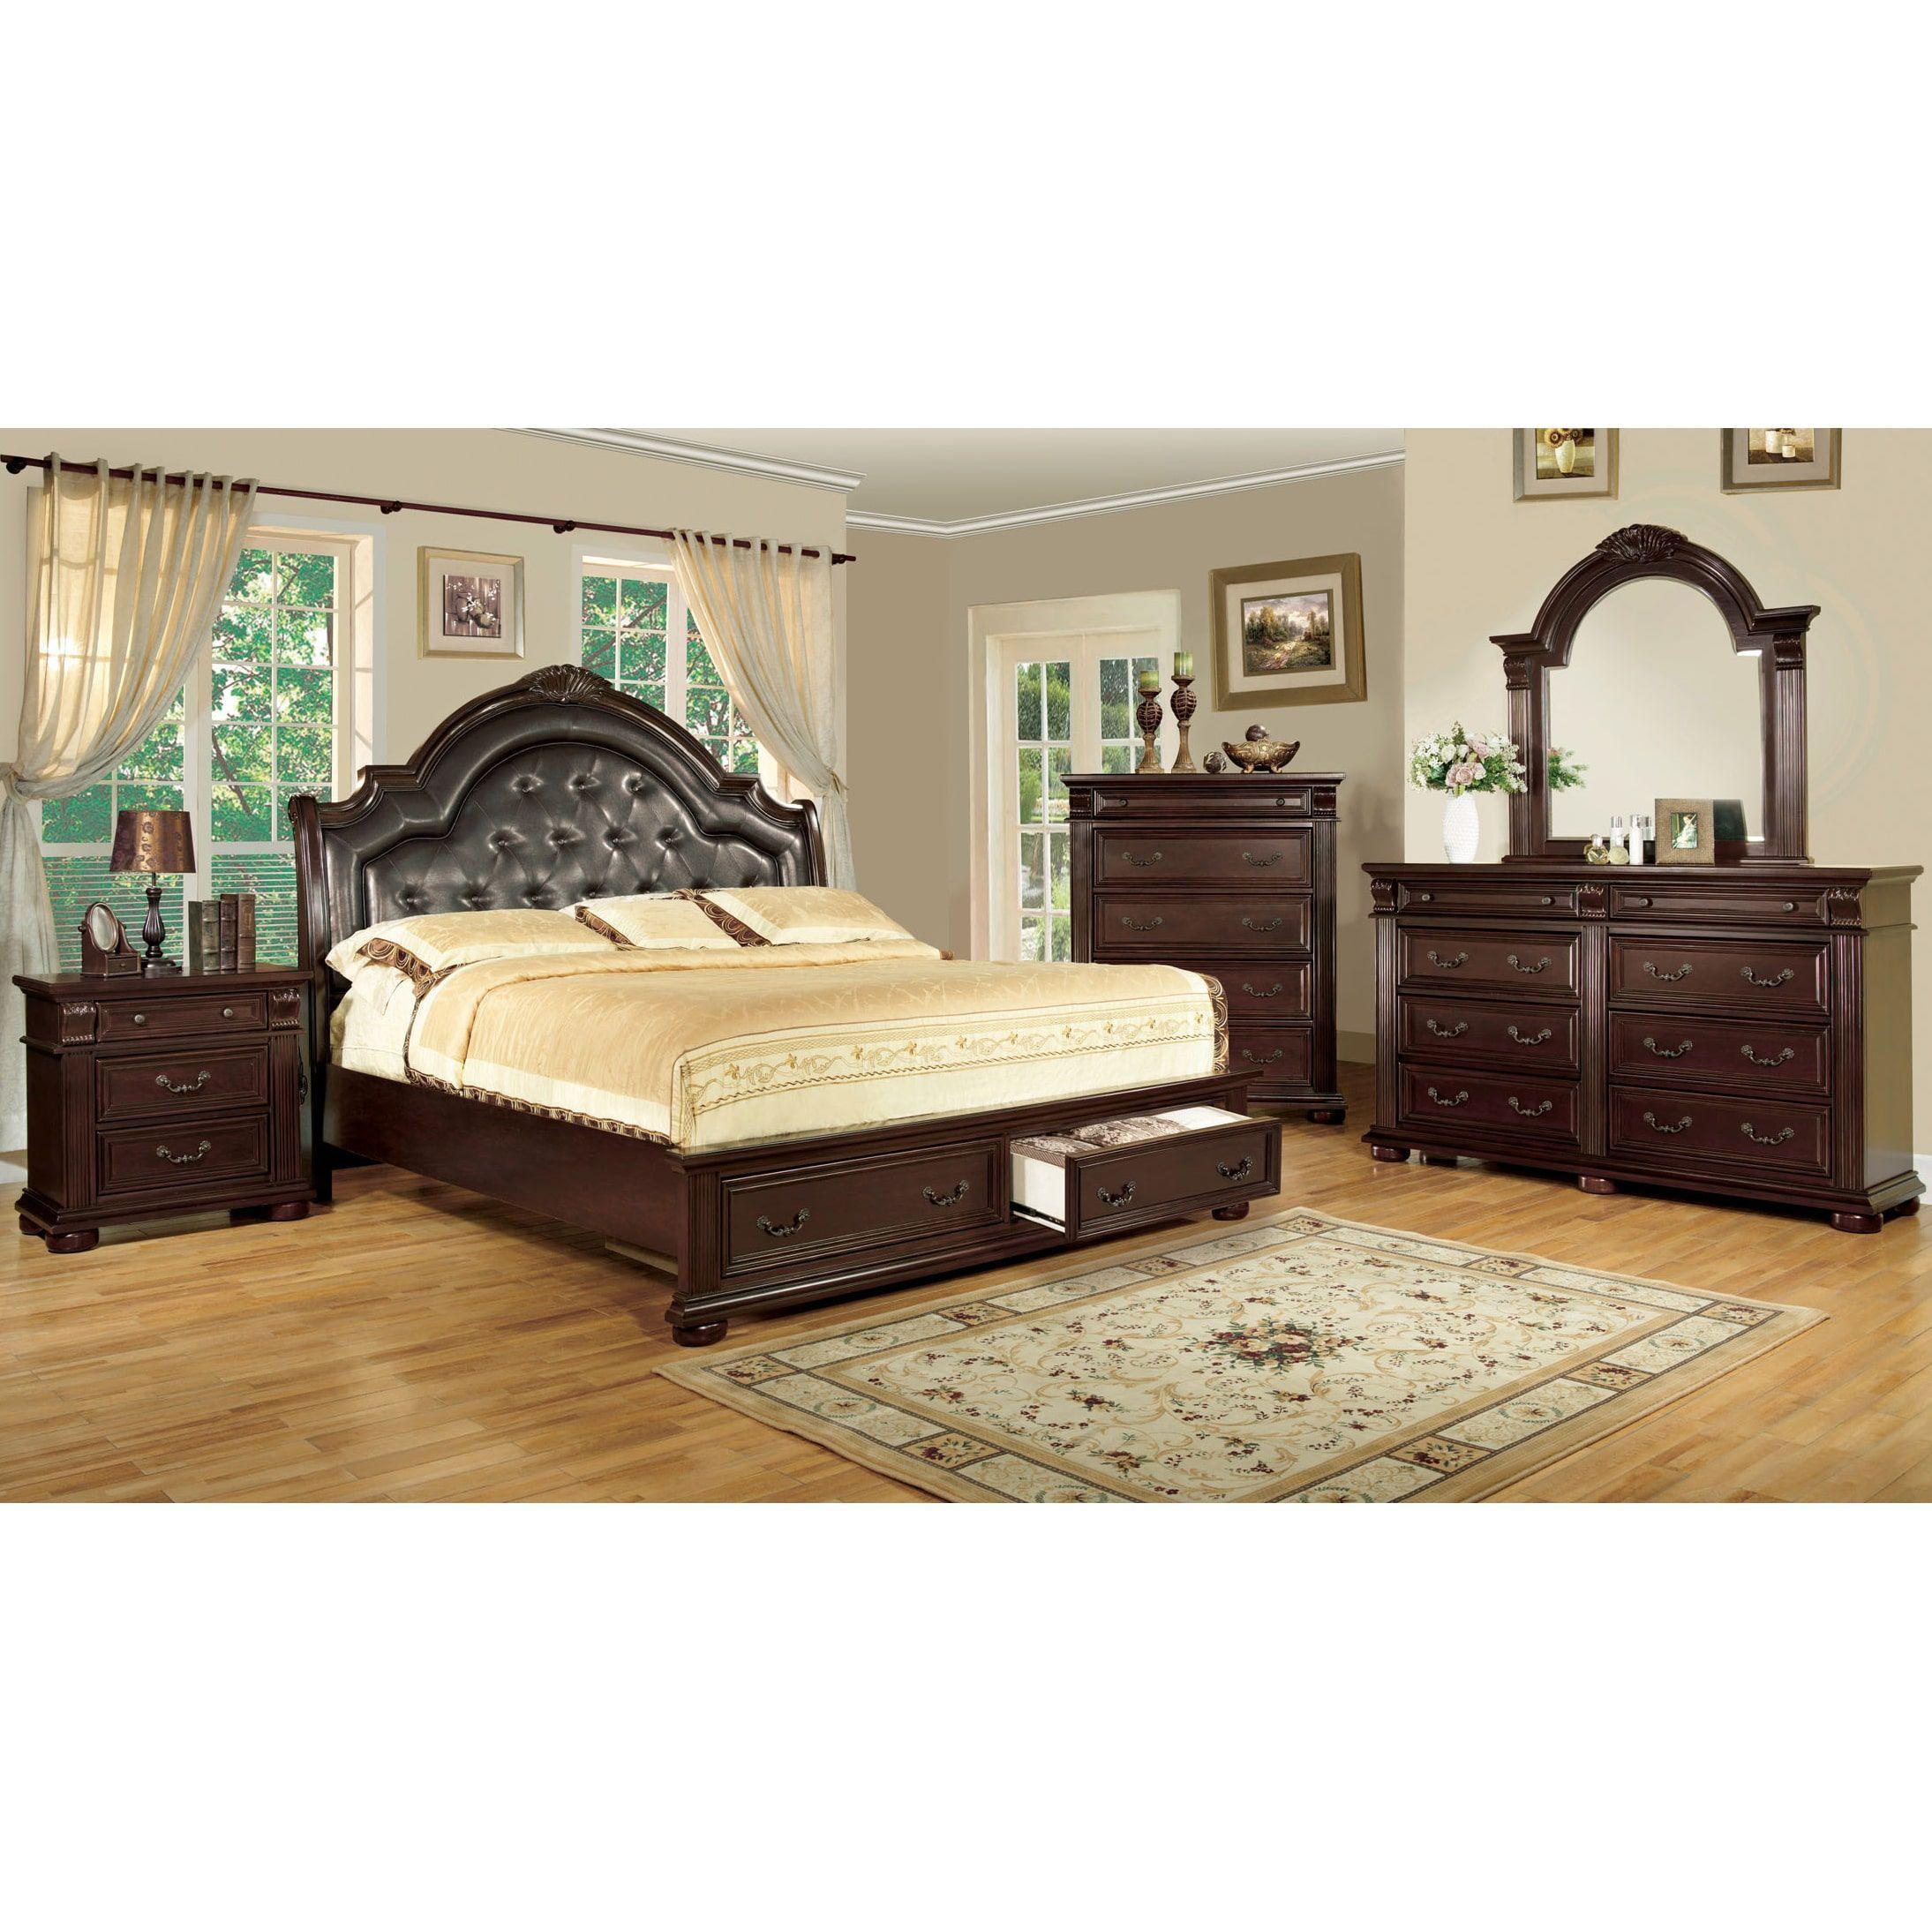 Furniture Of America Lauretta English Style 4 Piece Brown Cherry Platform Bedroom  Set (Queen)